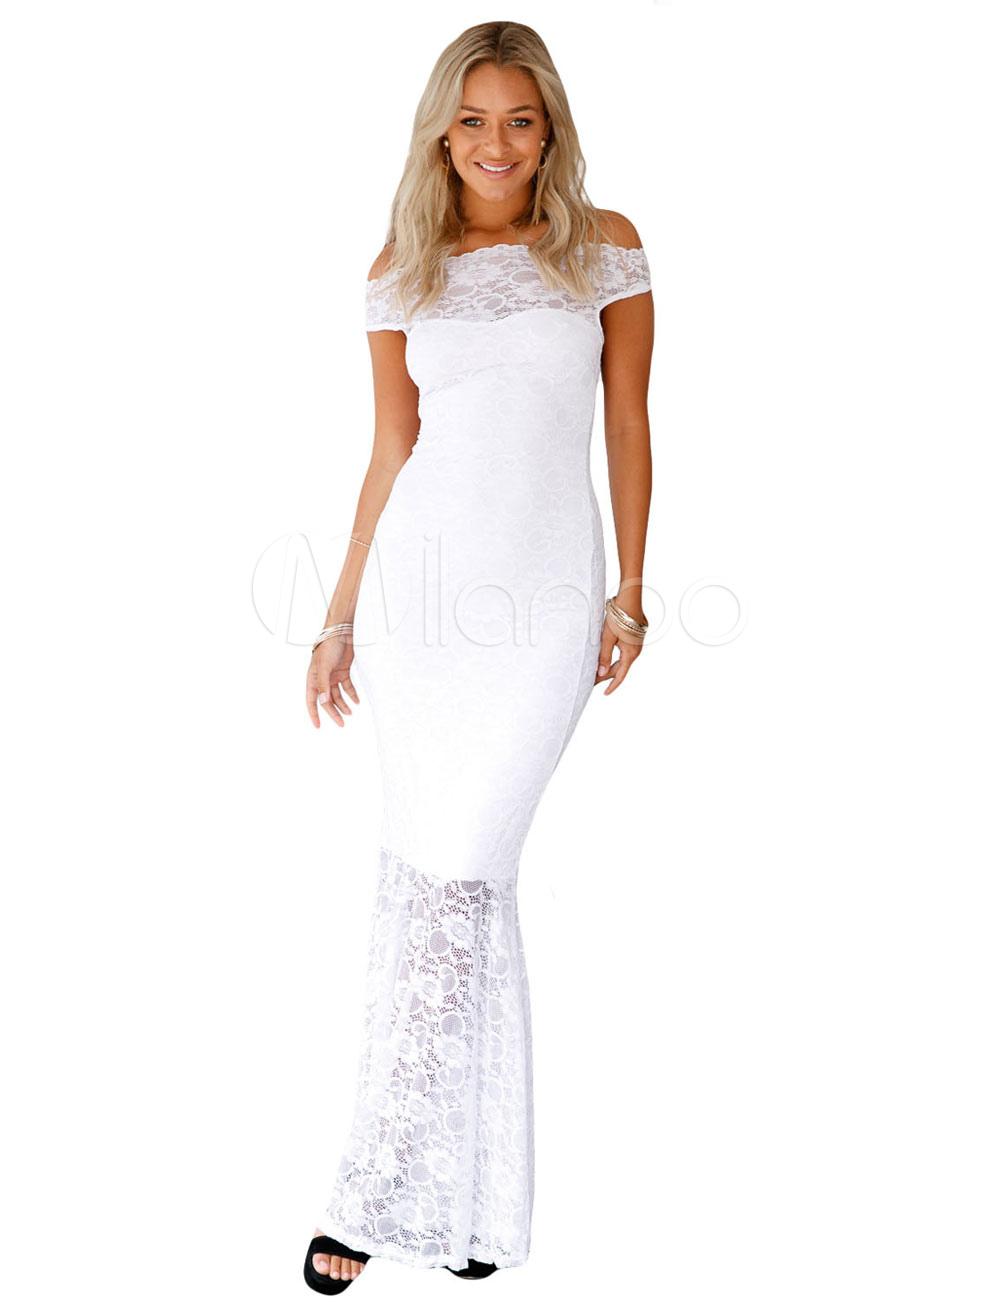 Lace Maxi Dress Off The Shoulders Short Sleeve Semi Sheer Pleated Mermaid Long Dress (Women\\'s Clothing Maxi Dresses) photo